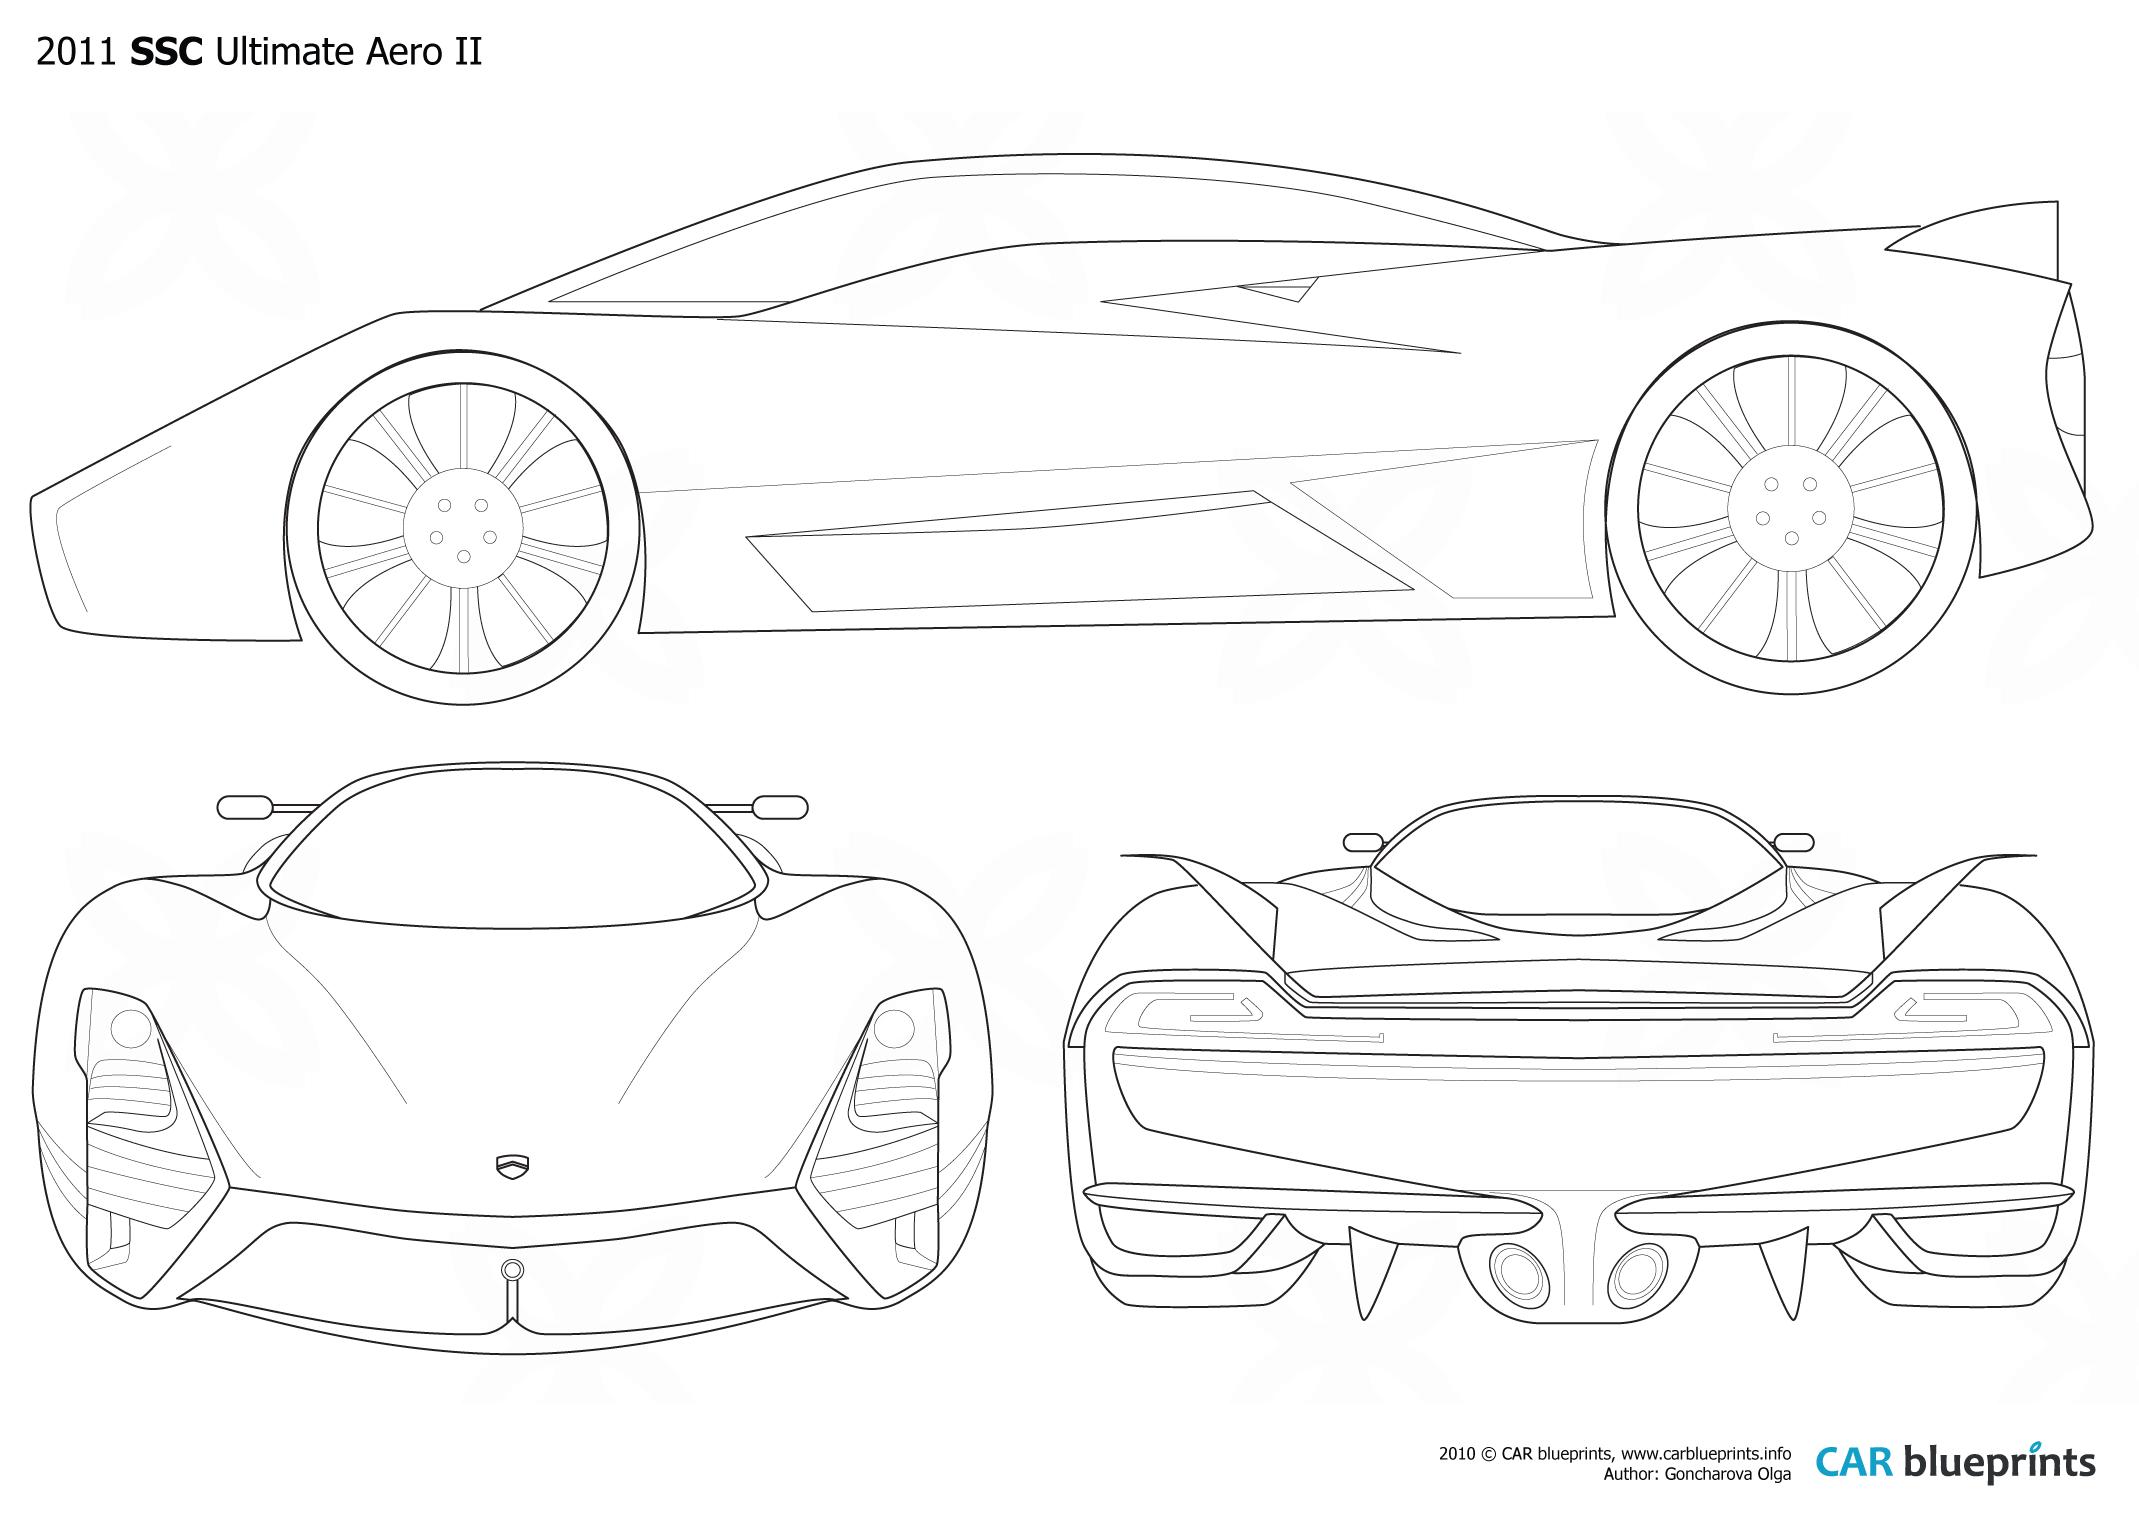 Car Blueprints Ssc Ultimate Aero Ii Blueprints Vector Drawings